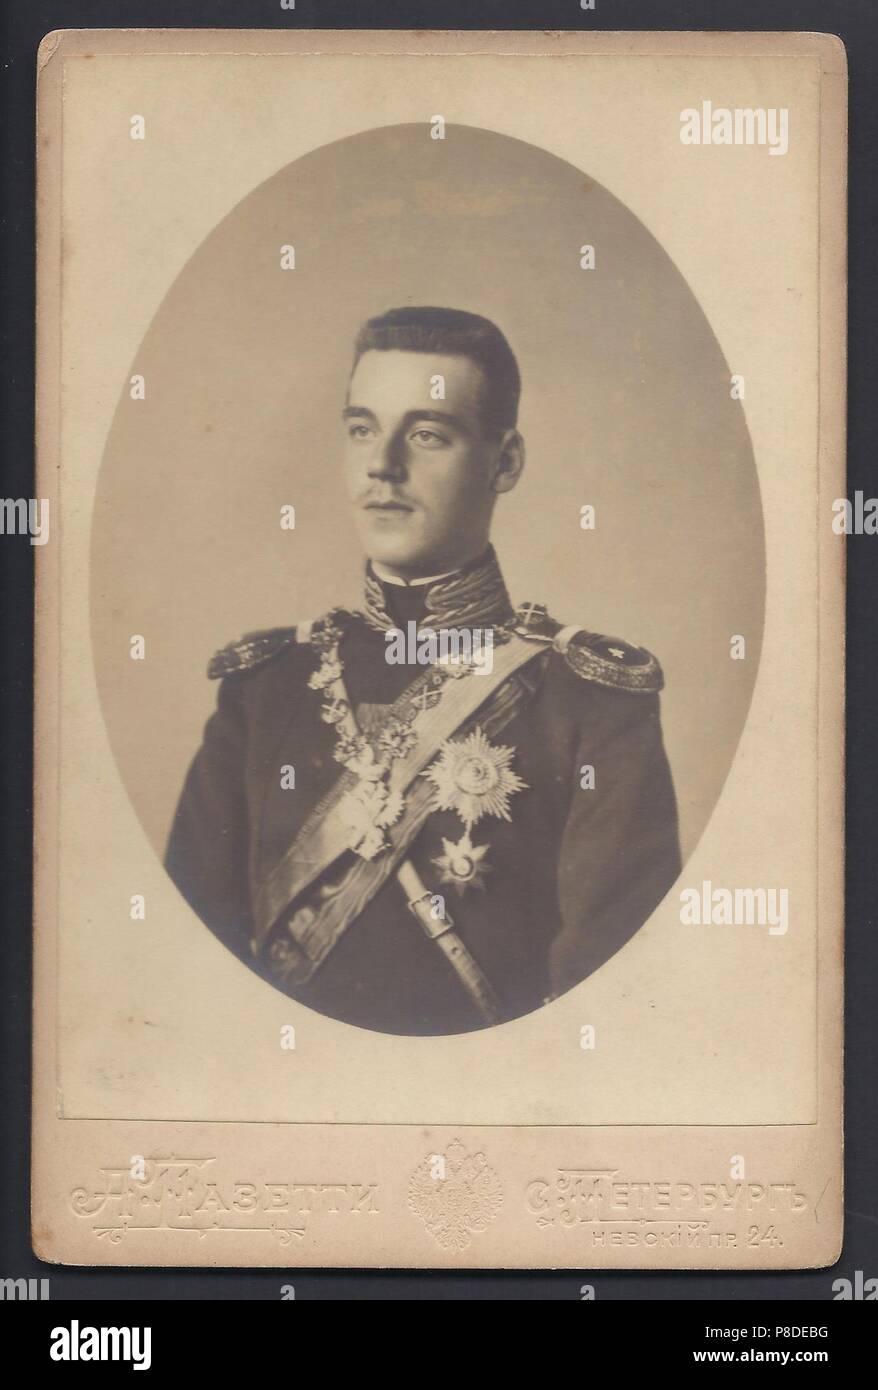 Grand Duke Michael Alexandrovich of Russia (1878-1918). Museum: PRIVATE COLLECTION. Stock Photo